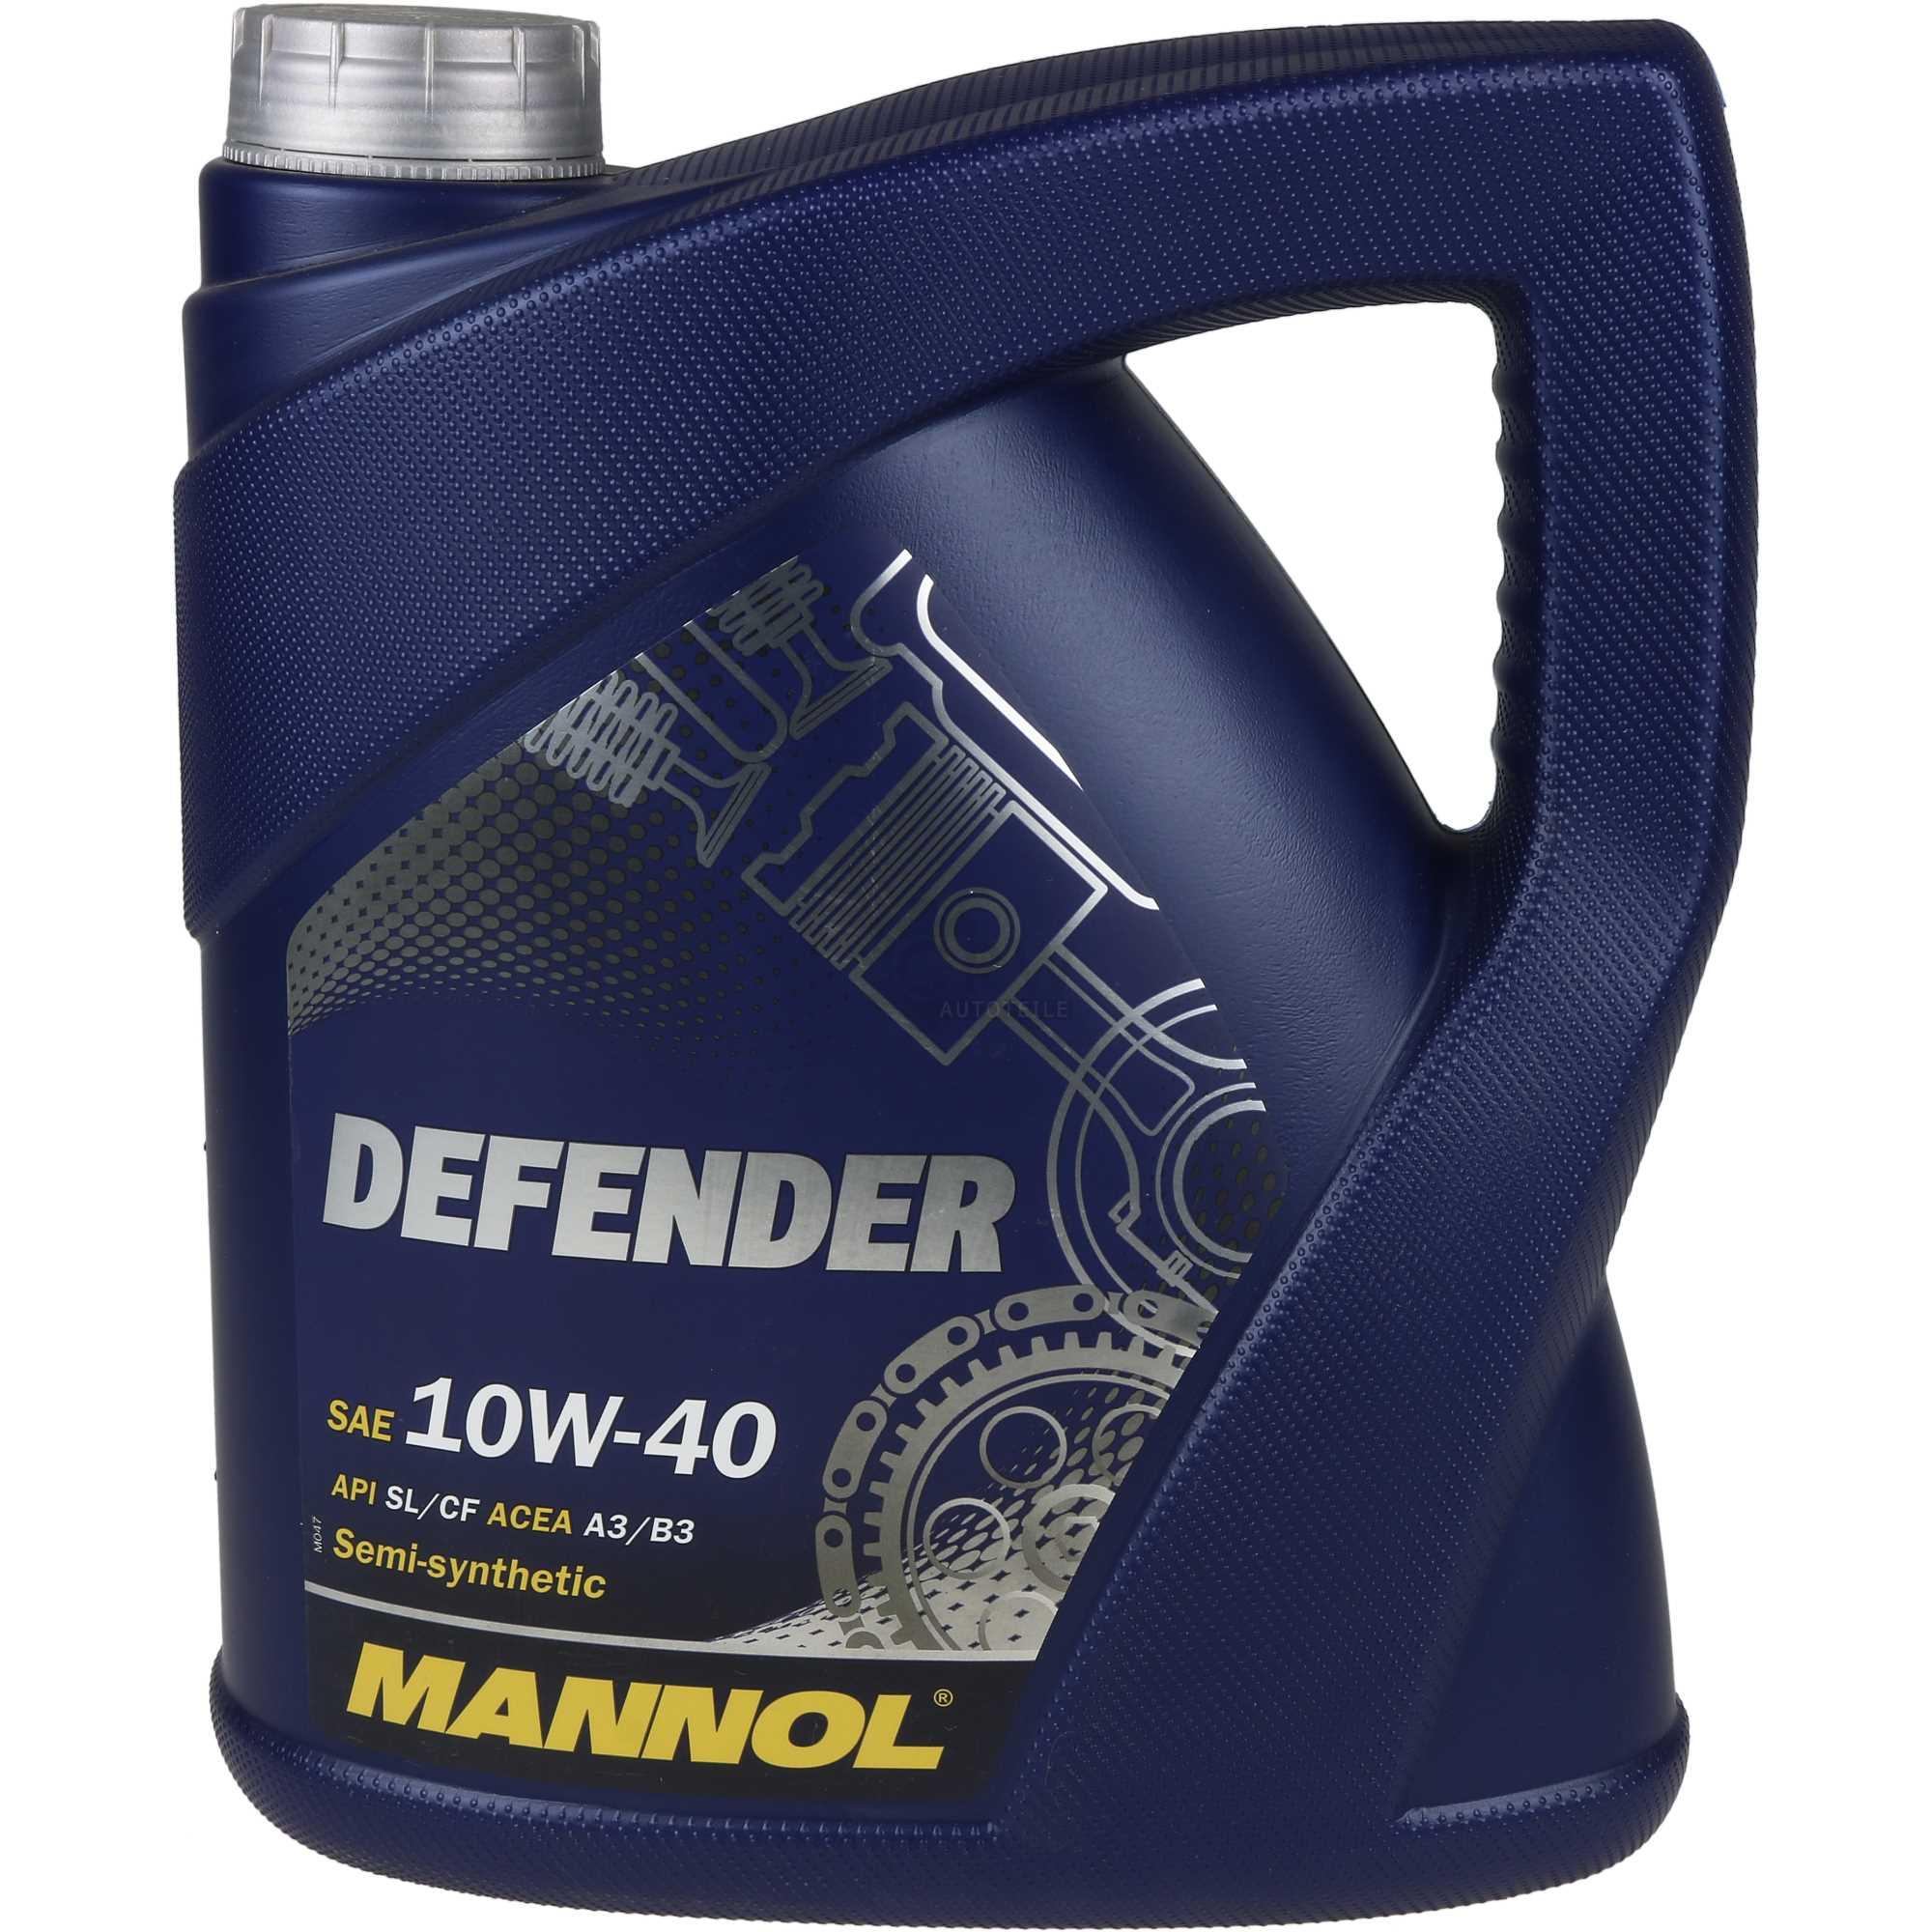 Aceite-del-motor-aceite-5w40-10w40-15w40-5w30-10w60-1l-4l-5l-7l-10l-20l miniatura 10